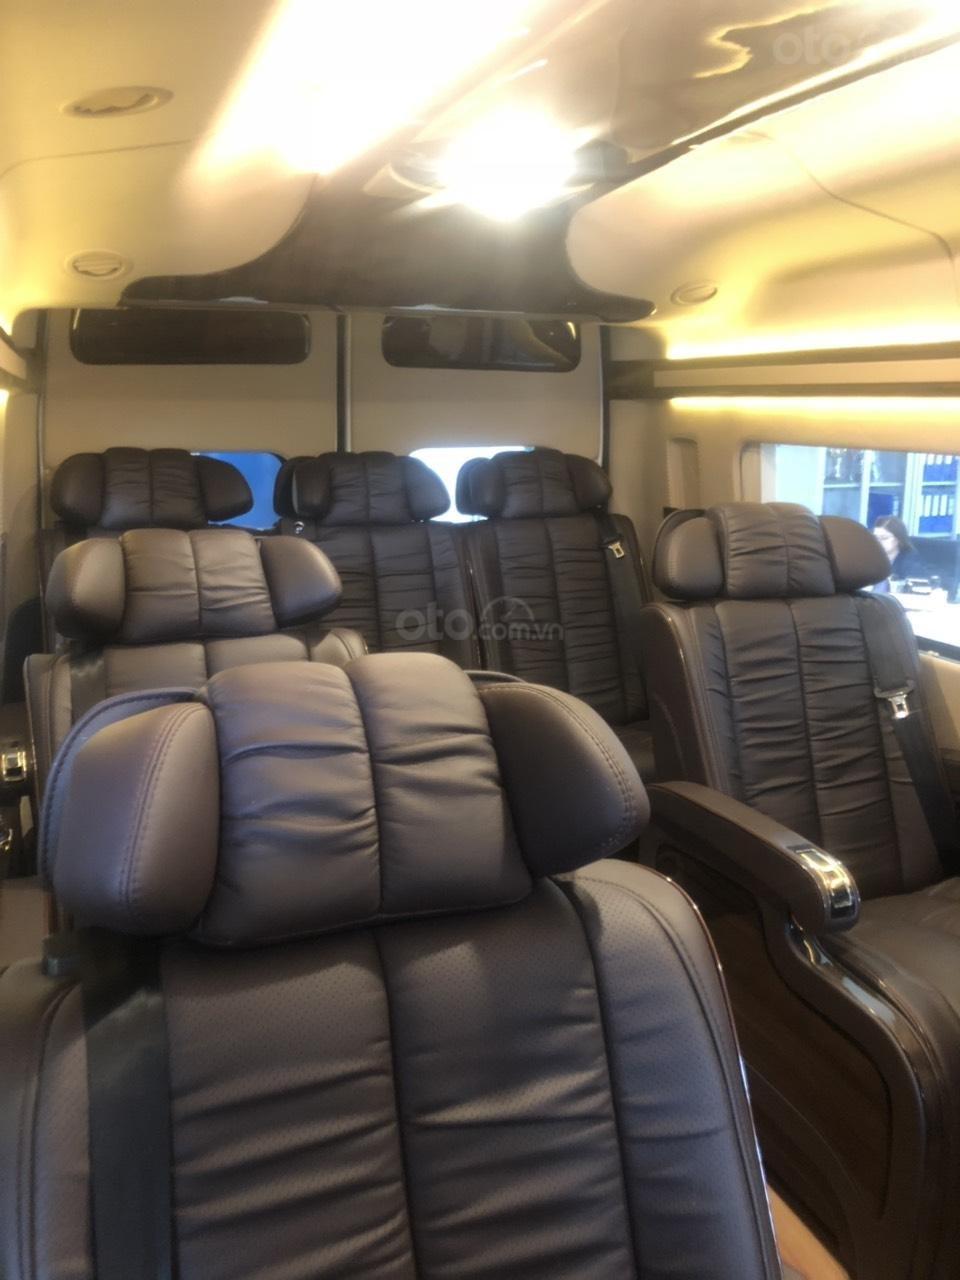 Transit Limousine 10 chỗ 2019 (11)